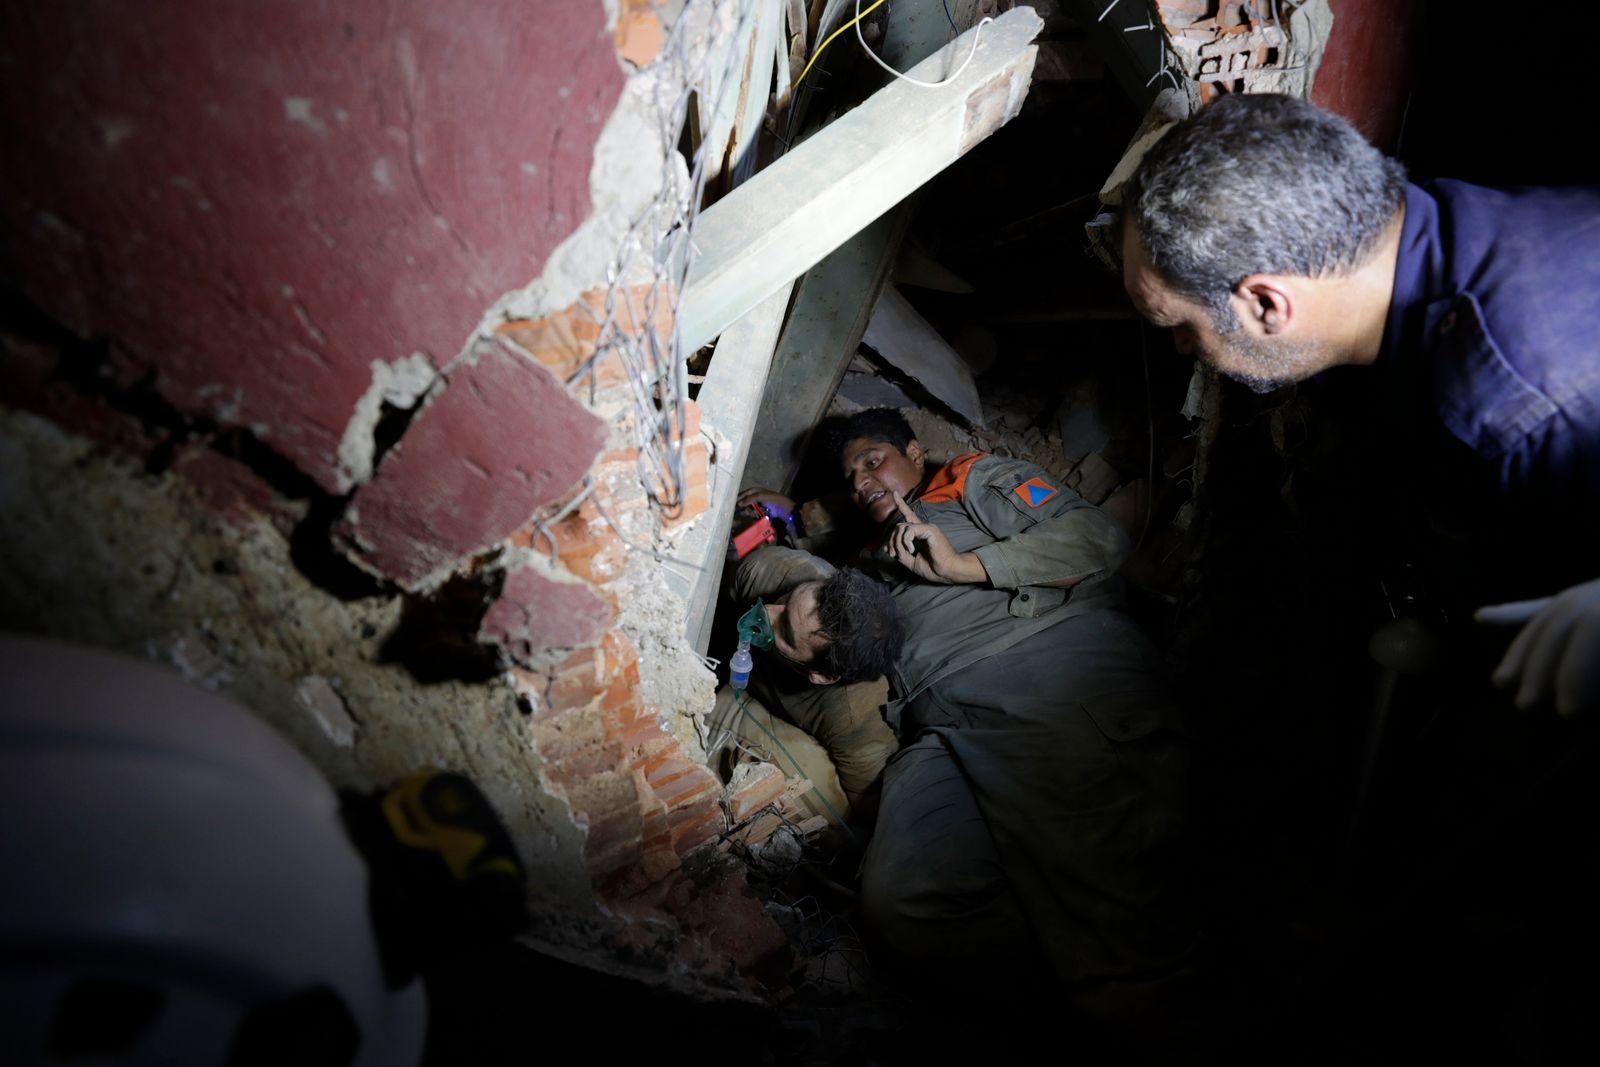 Lebanon Explosion Photo Gallery